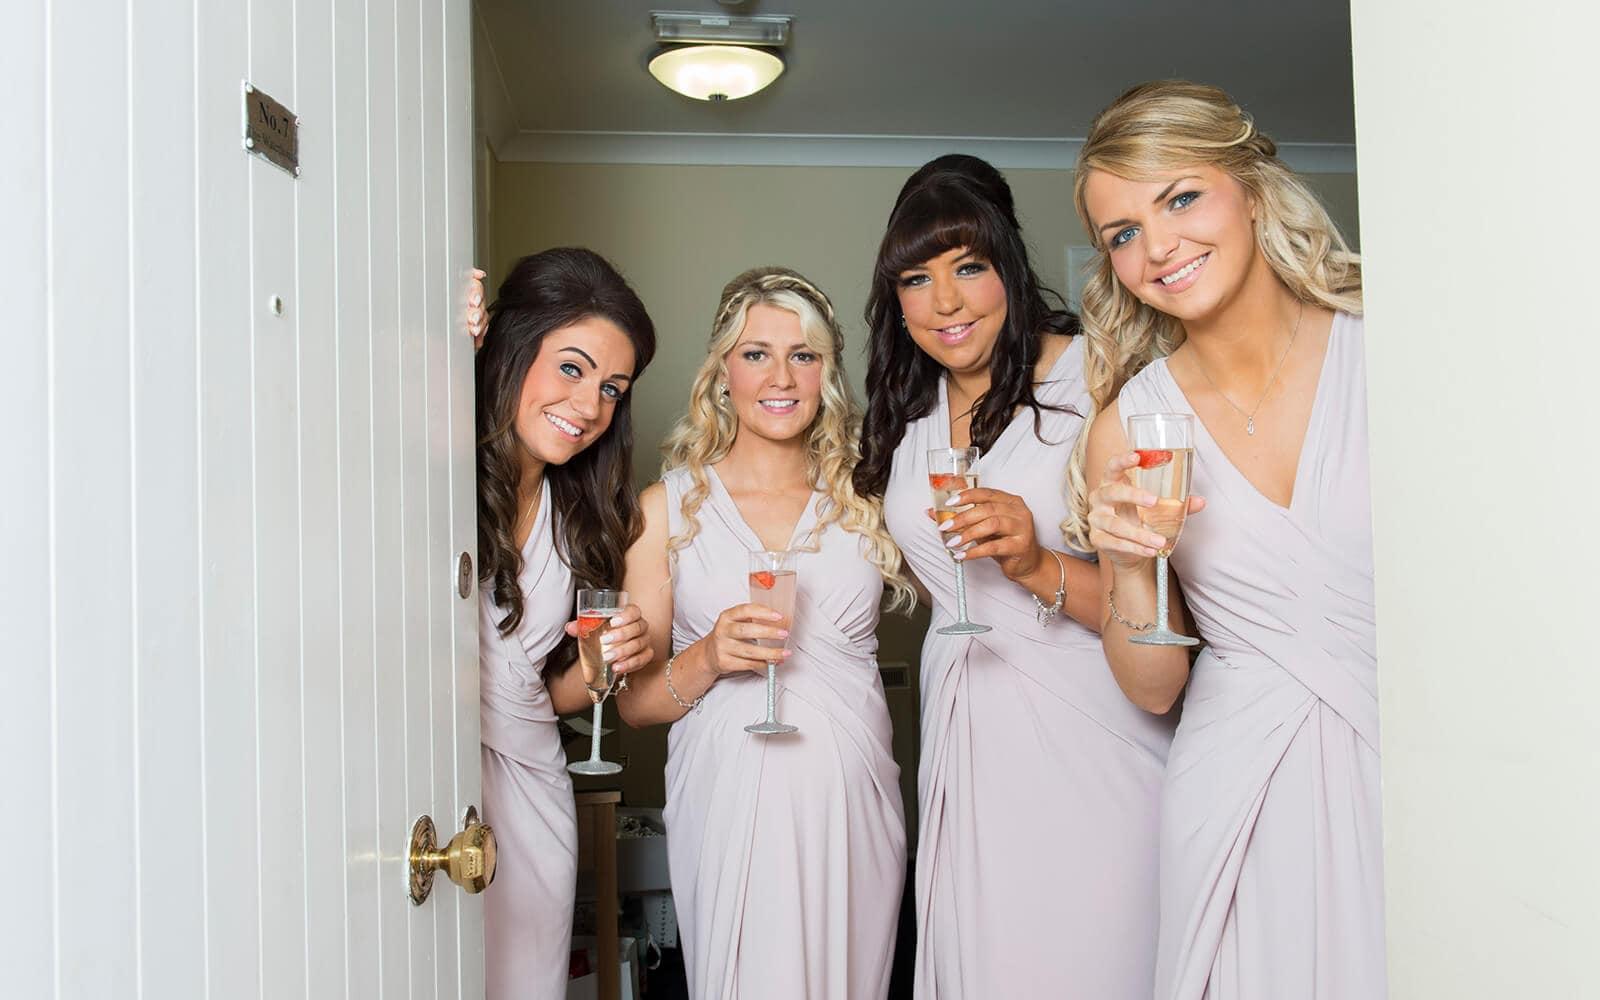 Ayrshire Wedding photos of bridesmaids